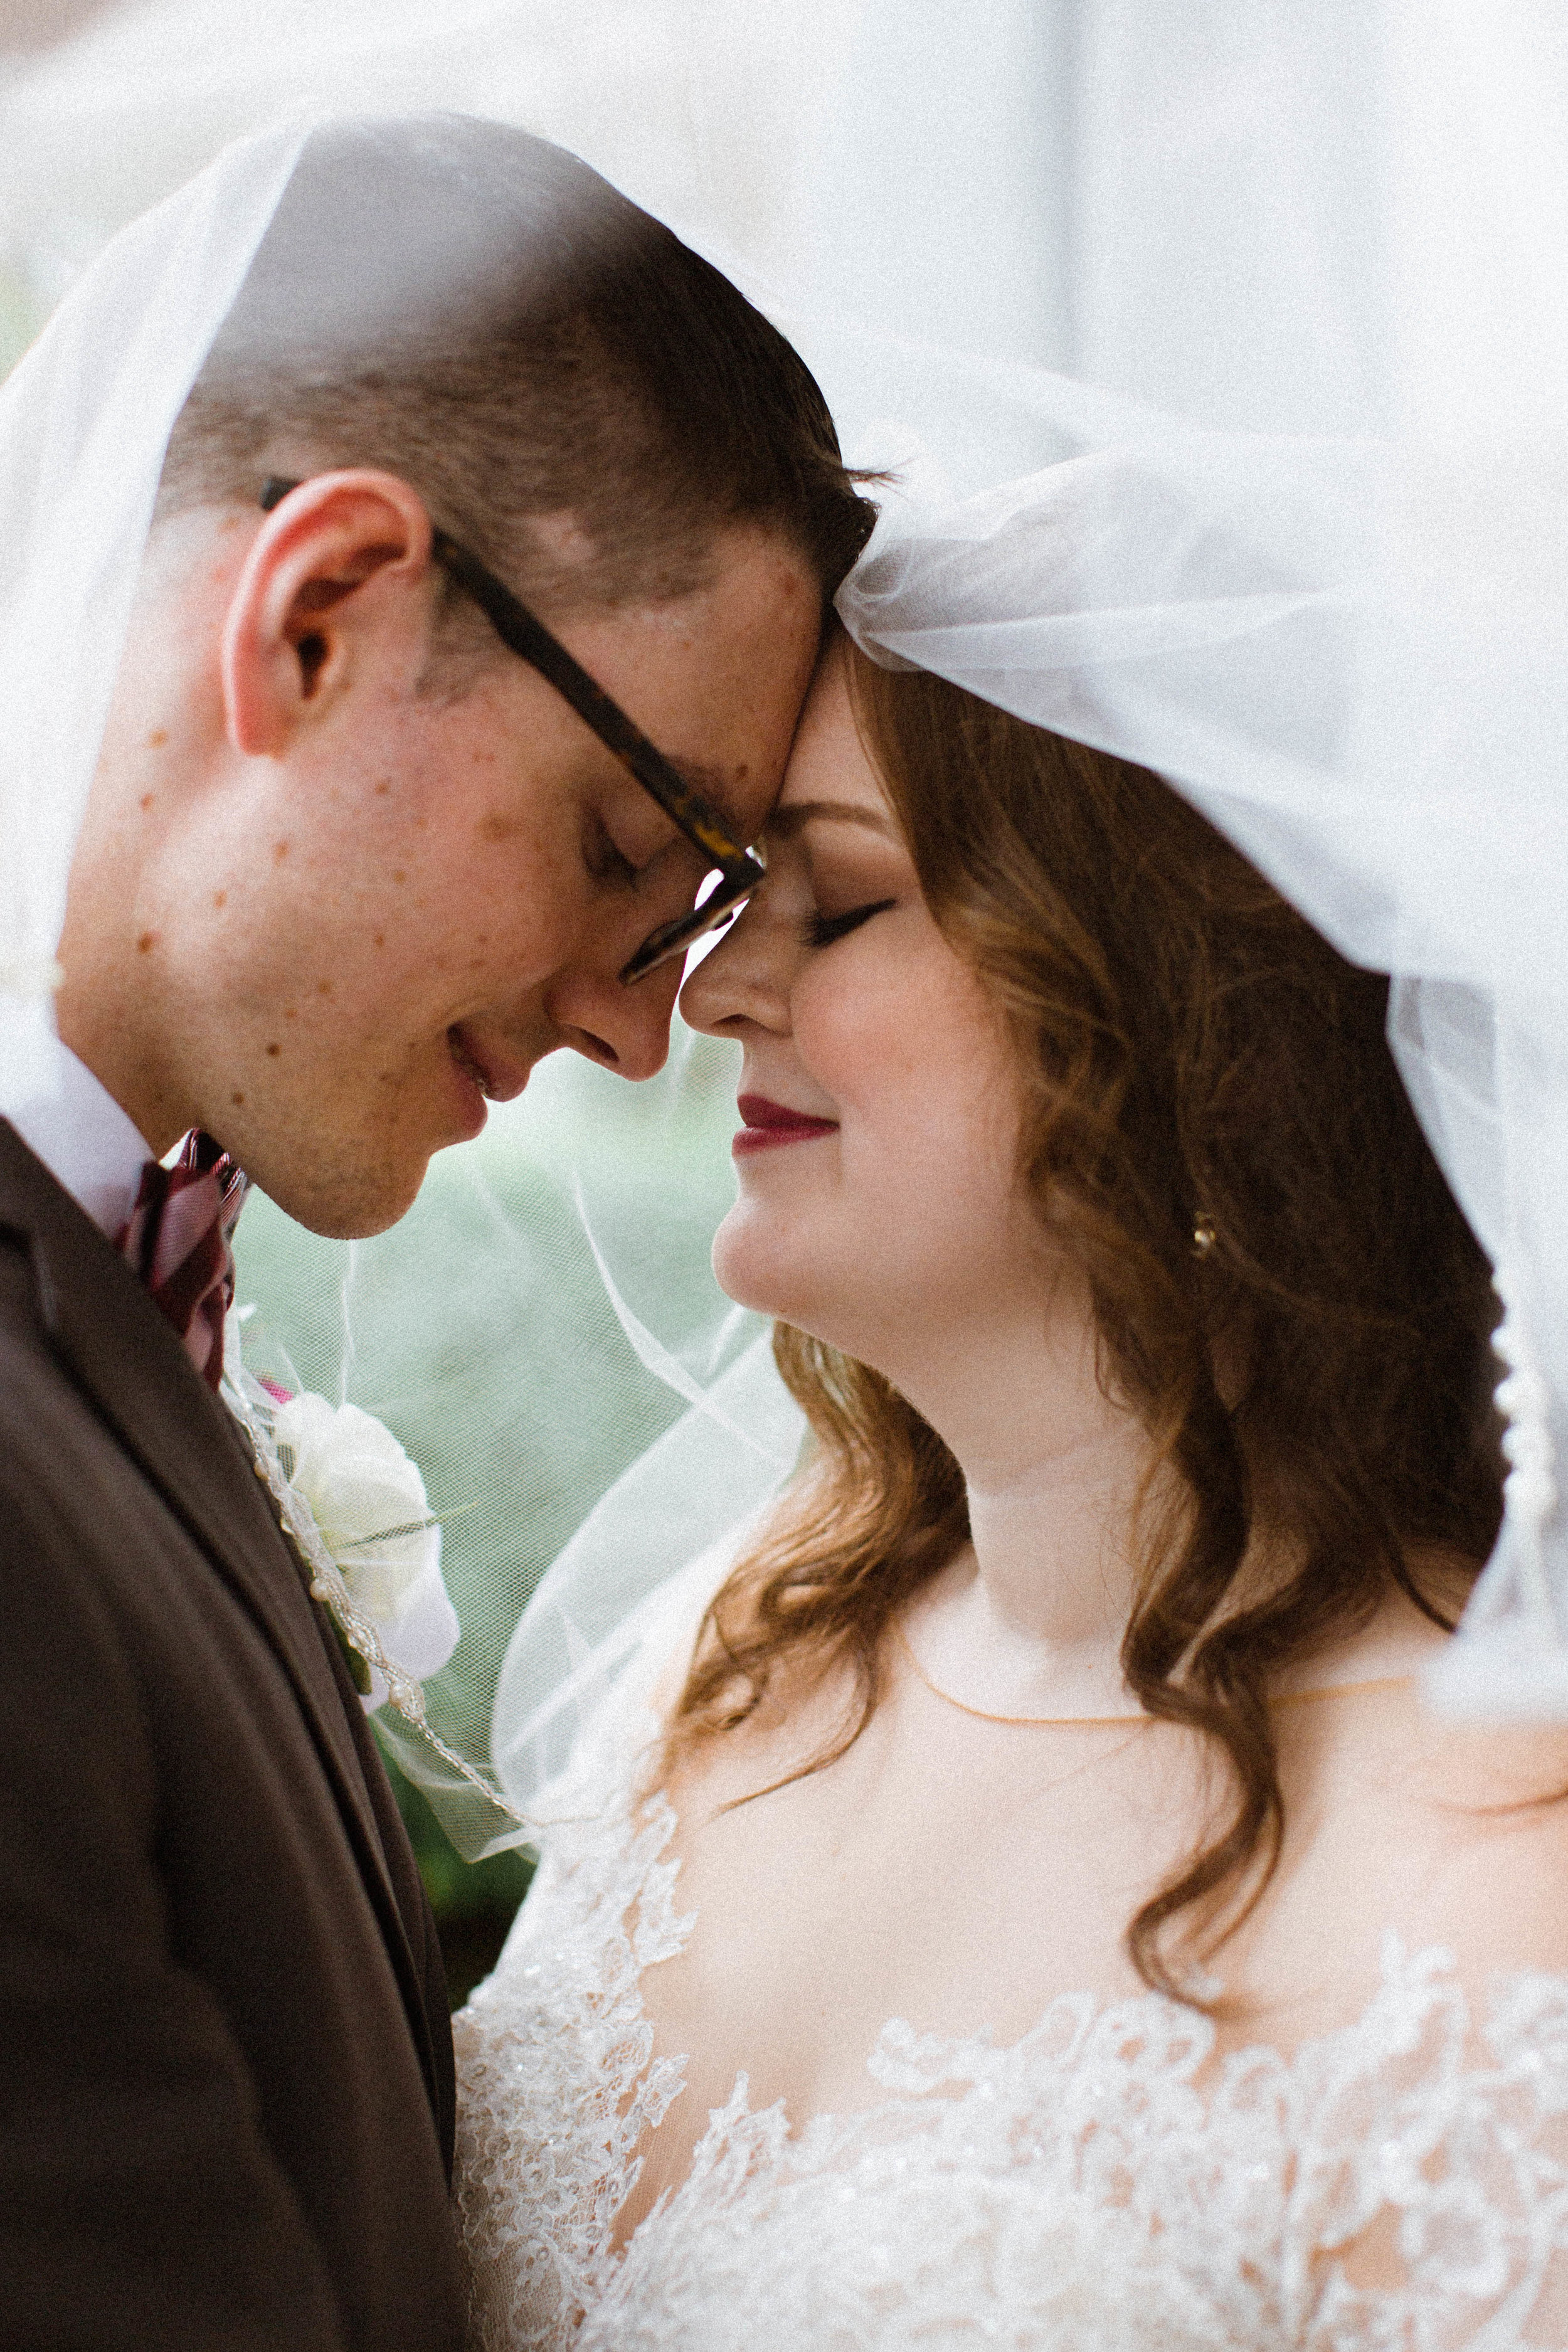 jennahazelphotography-marcy+ben-wedding-0248.jpg